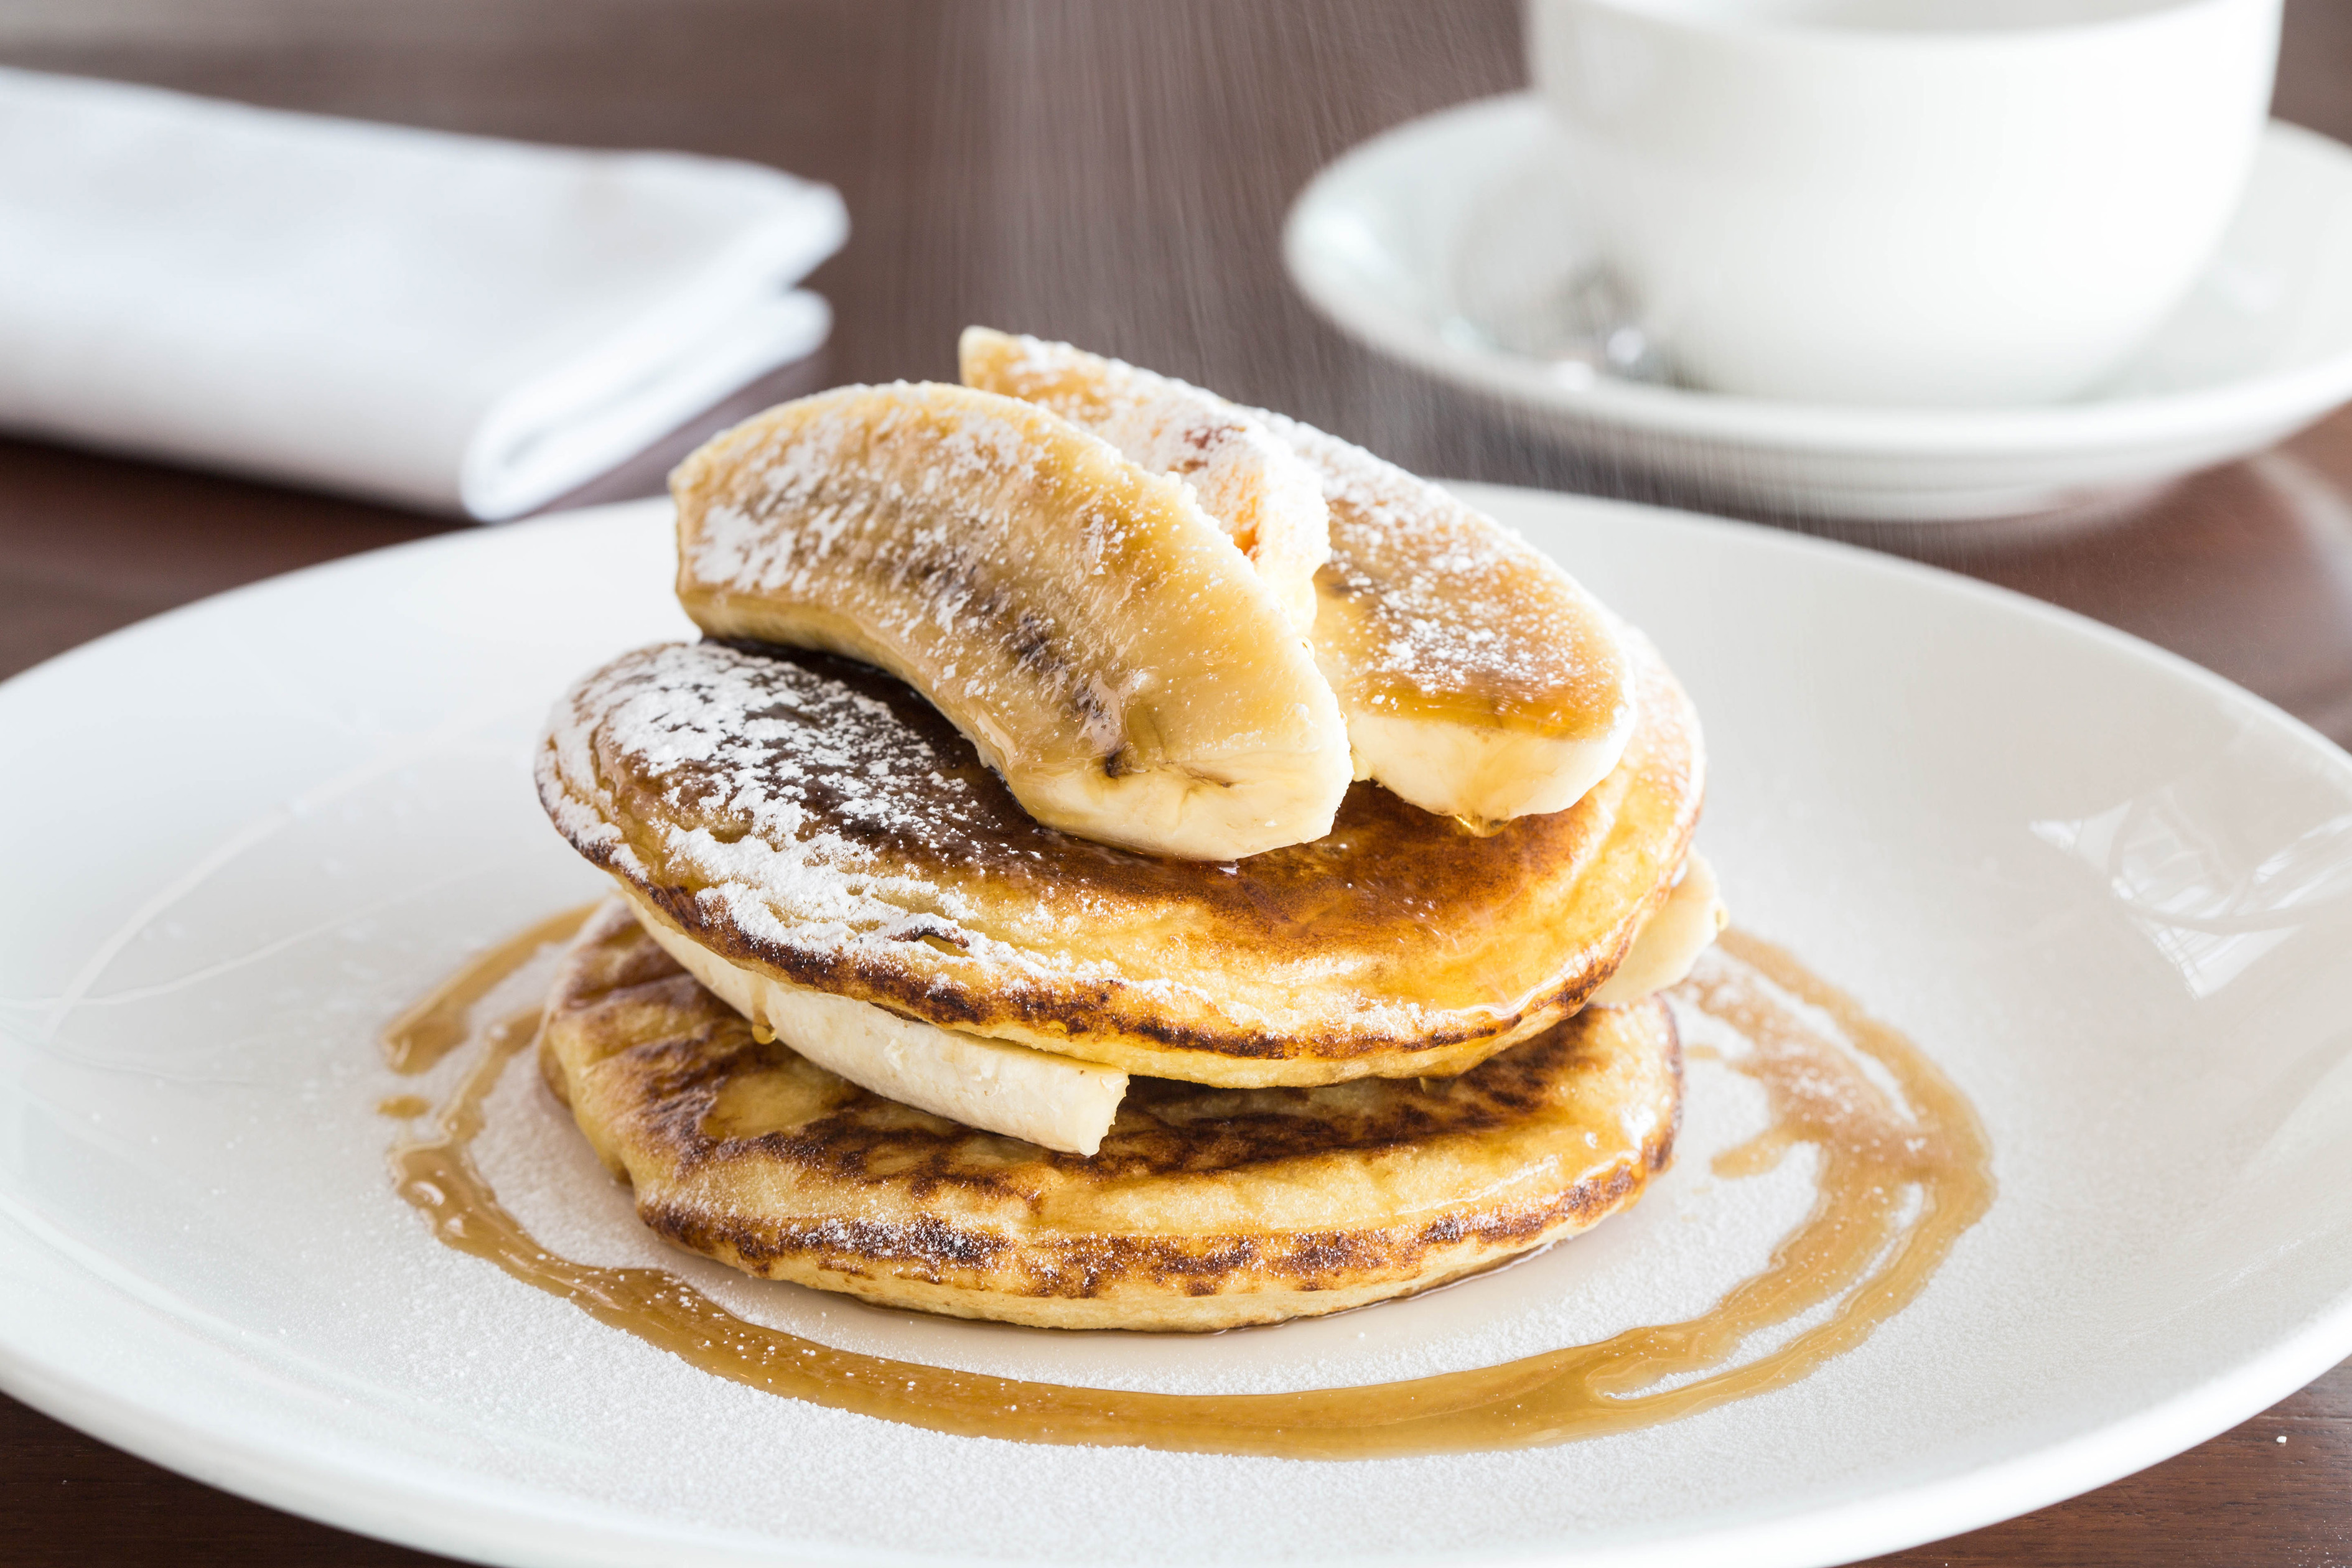 Gordon Ramsey's plane food pancakes